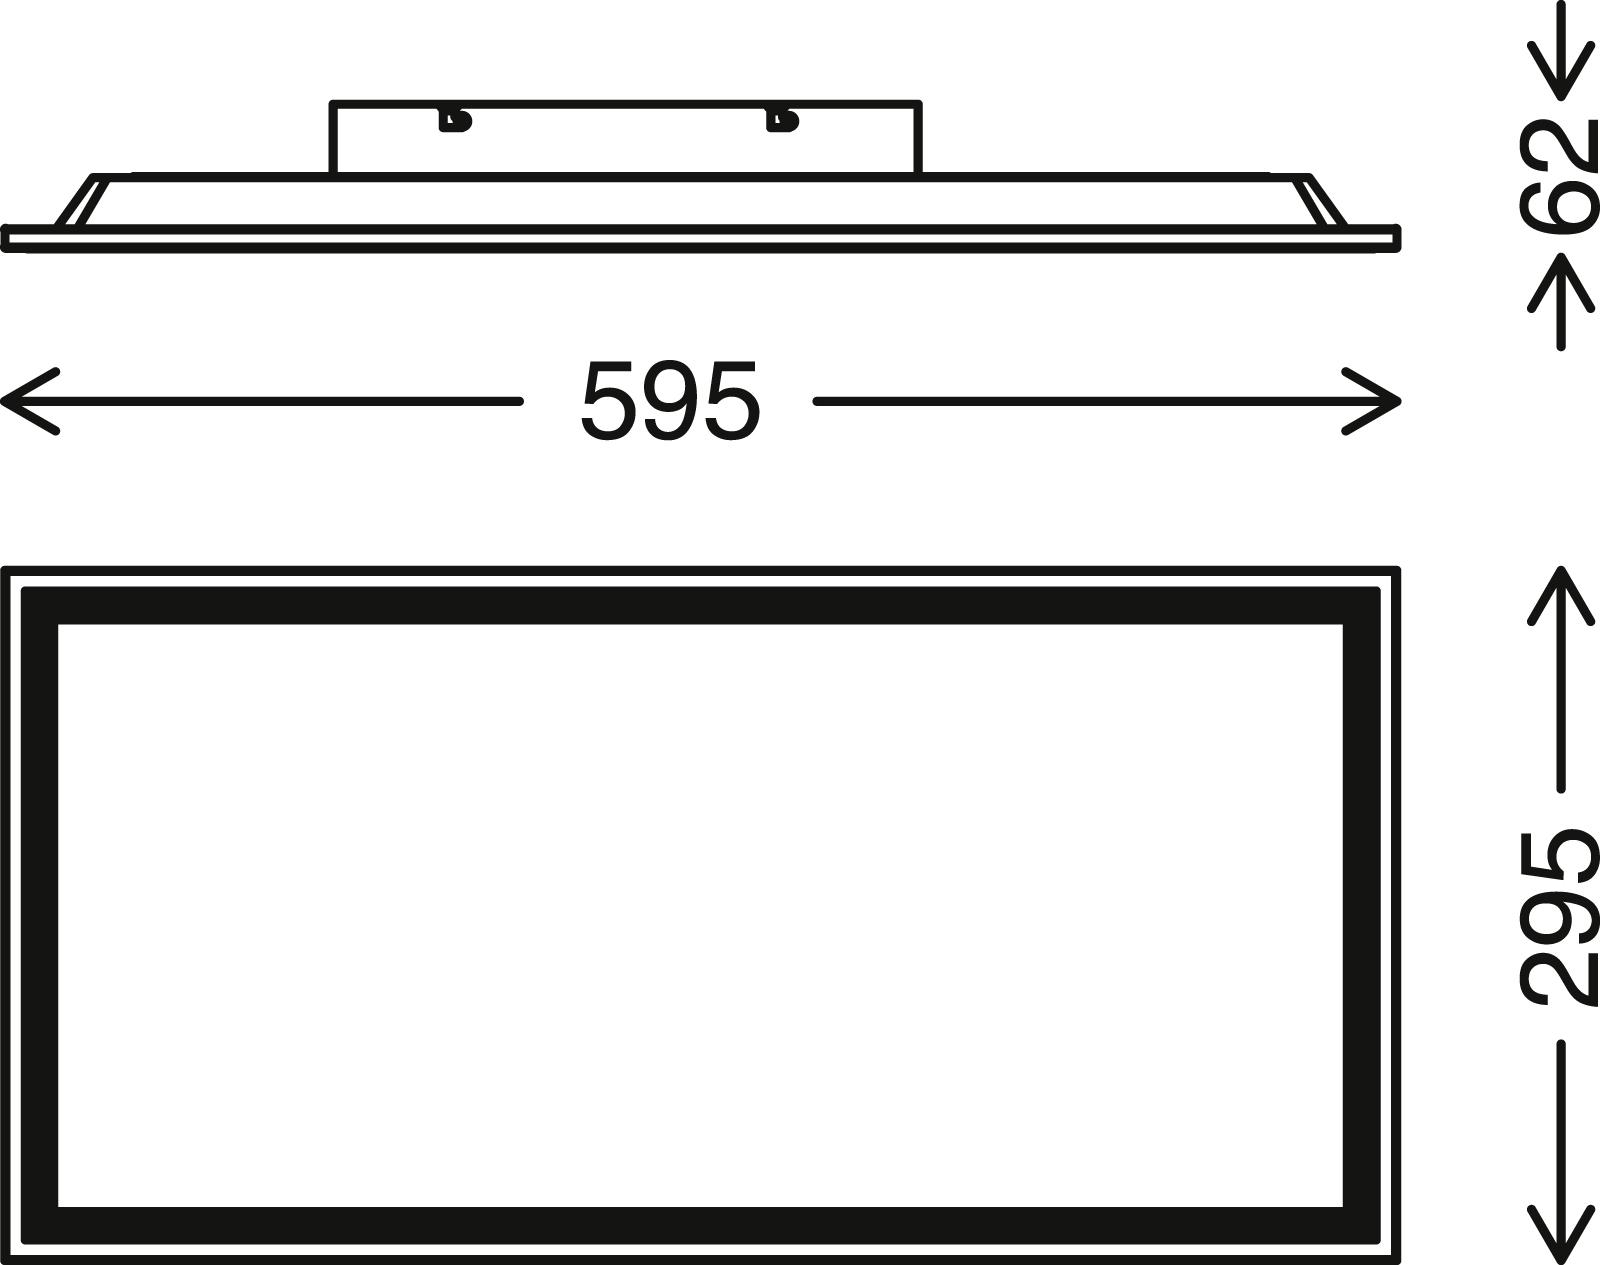 LED Panel, 59,5 cm, 2400 LUMEN, 24 WATT, Weiss